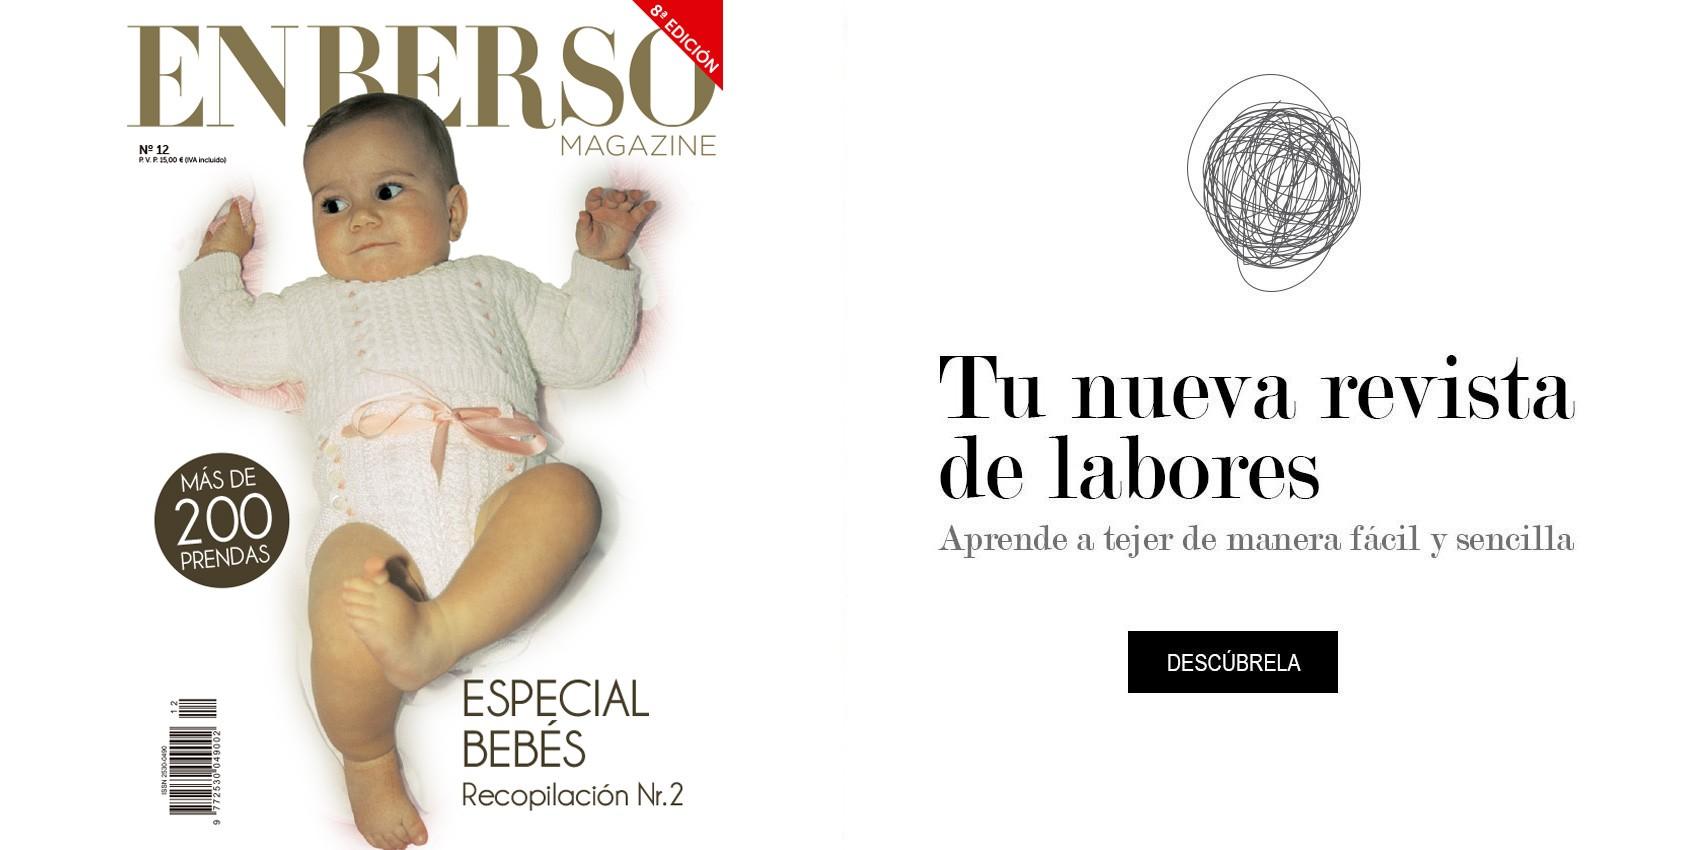 Enberso Magazine